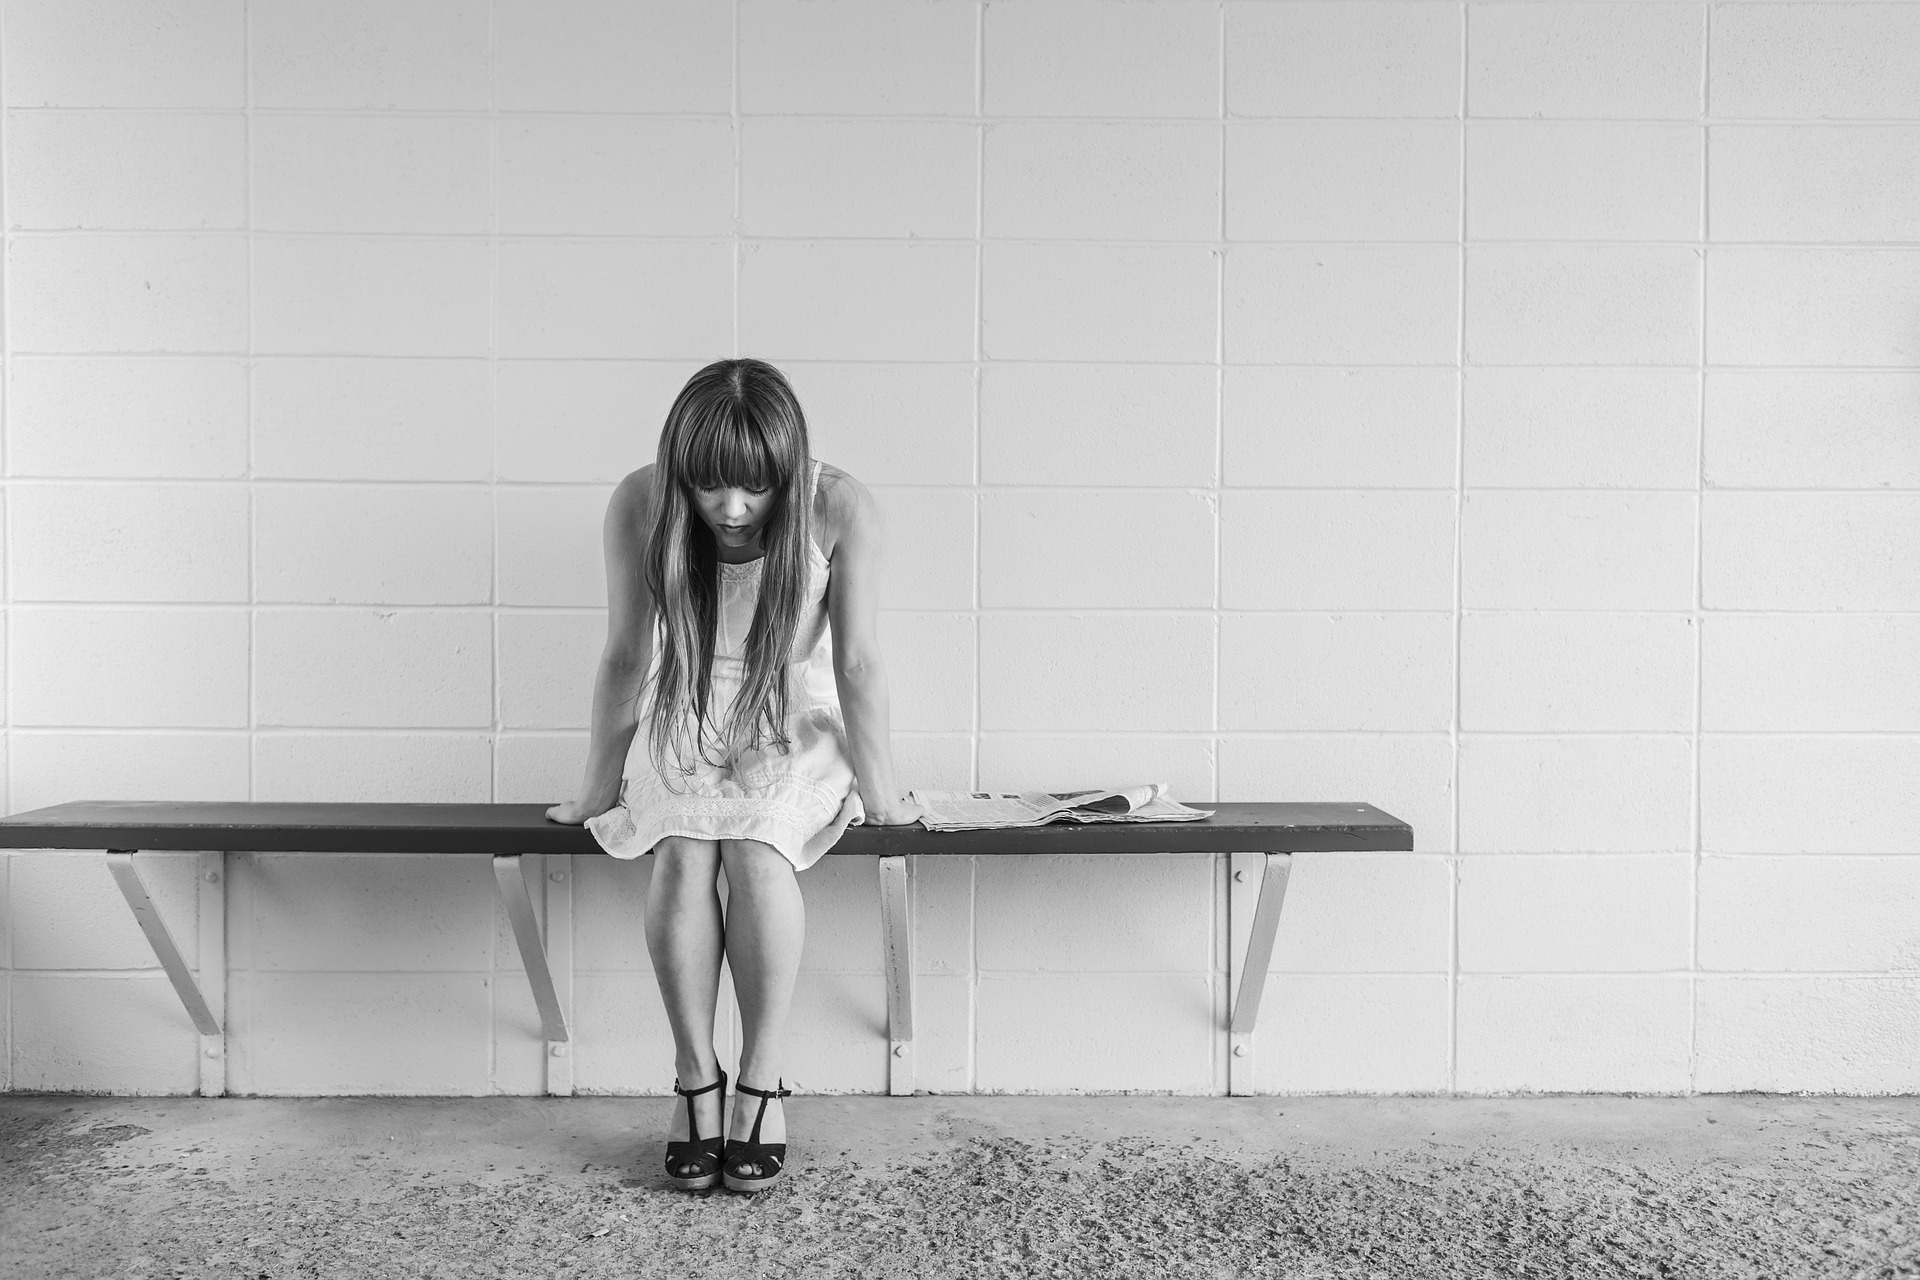 depression after injury